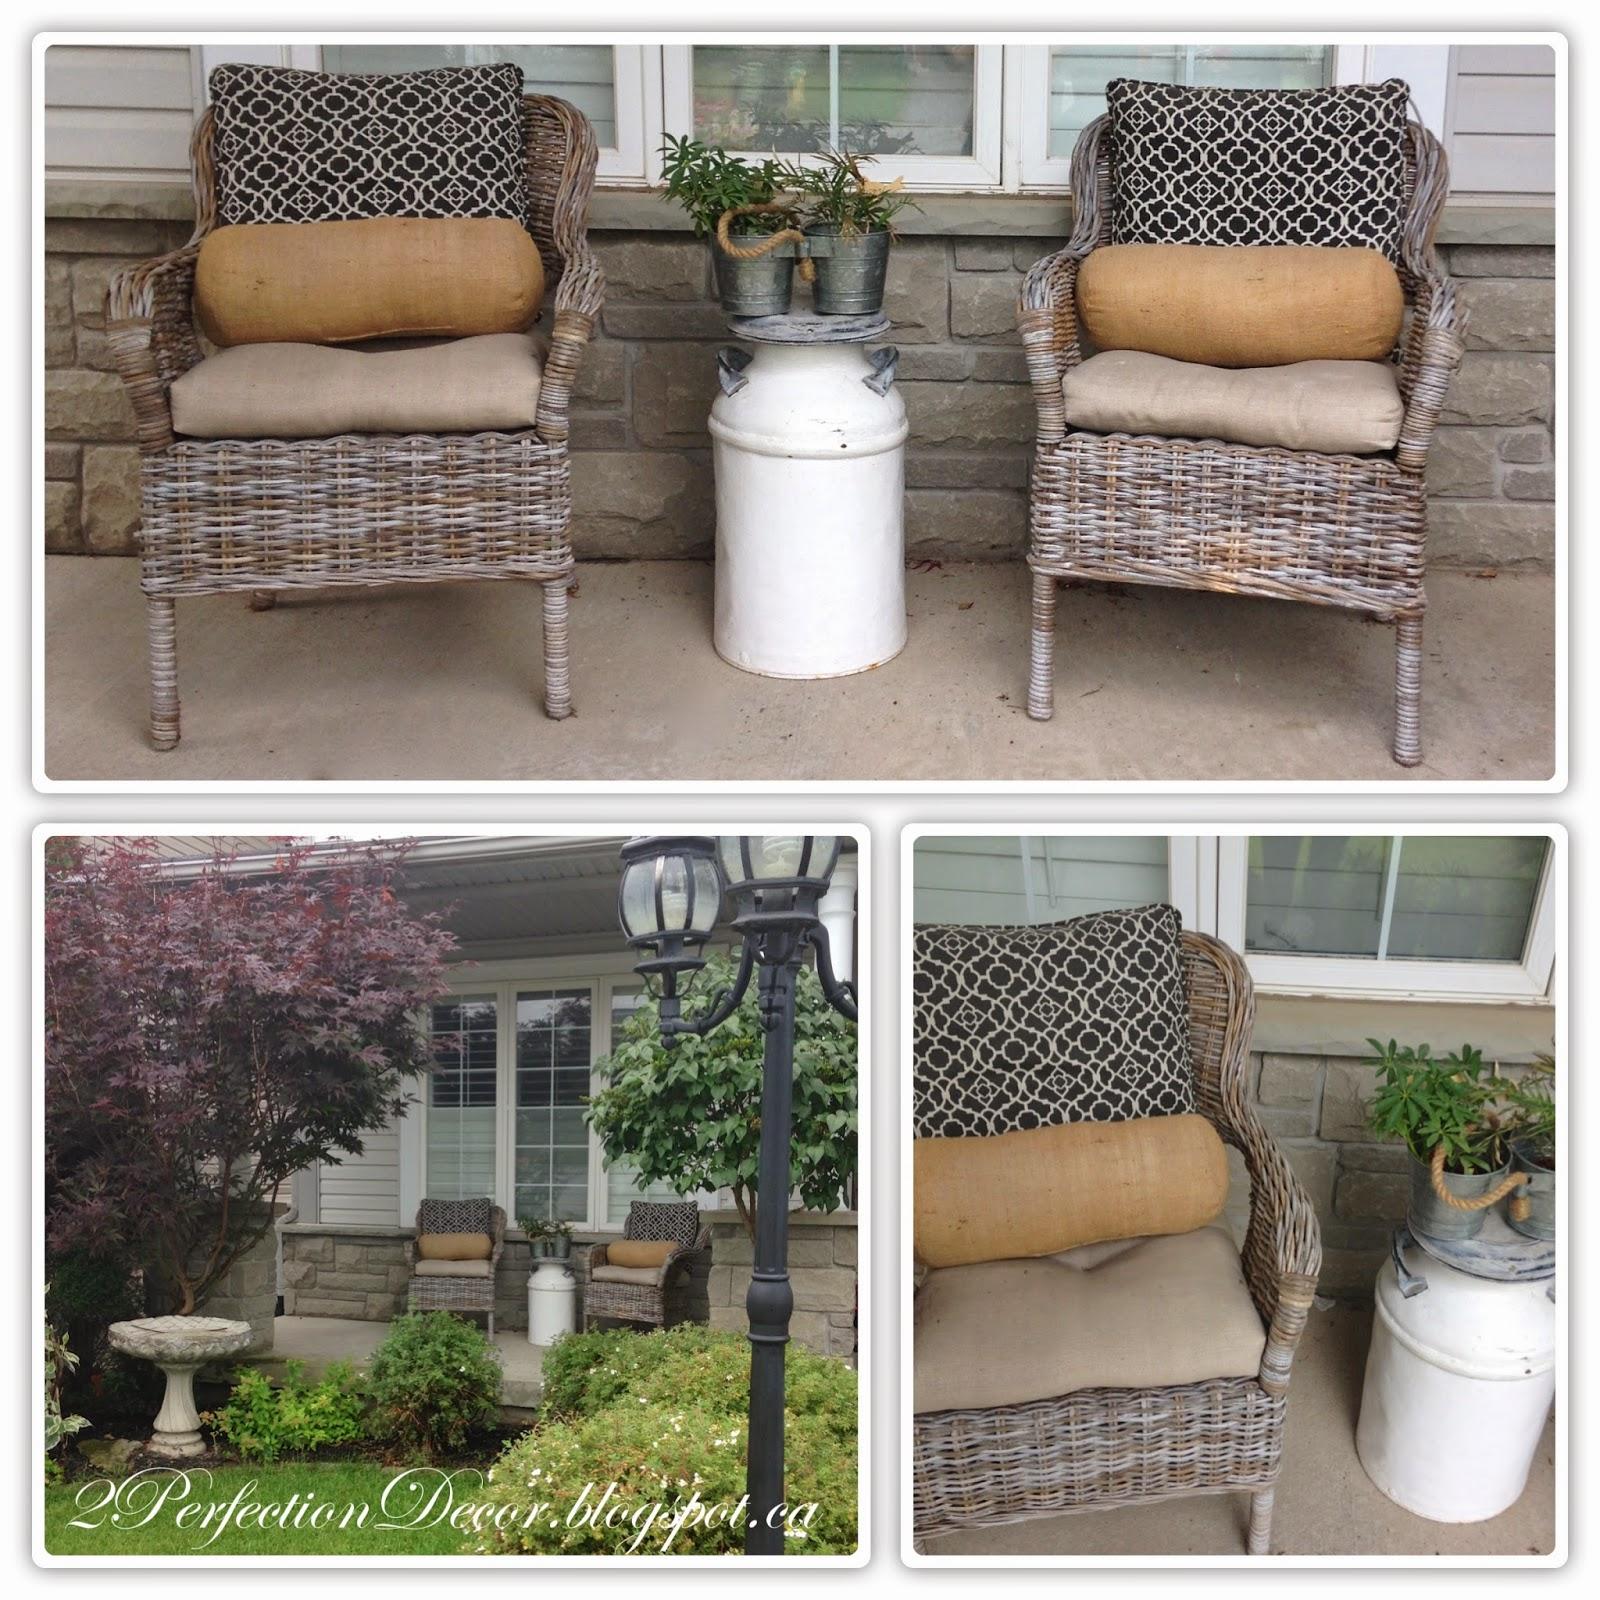 2Perfection Decor Summer Porch Love of Galvanized Steel & Burlap